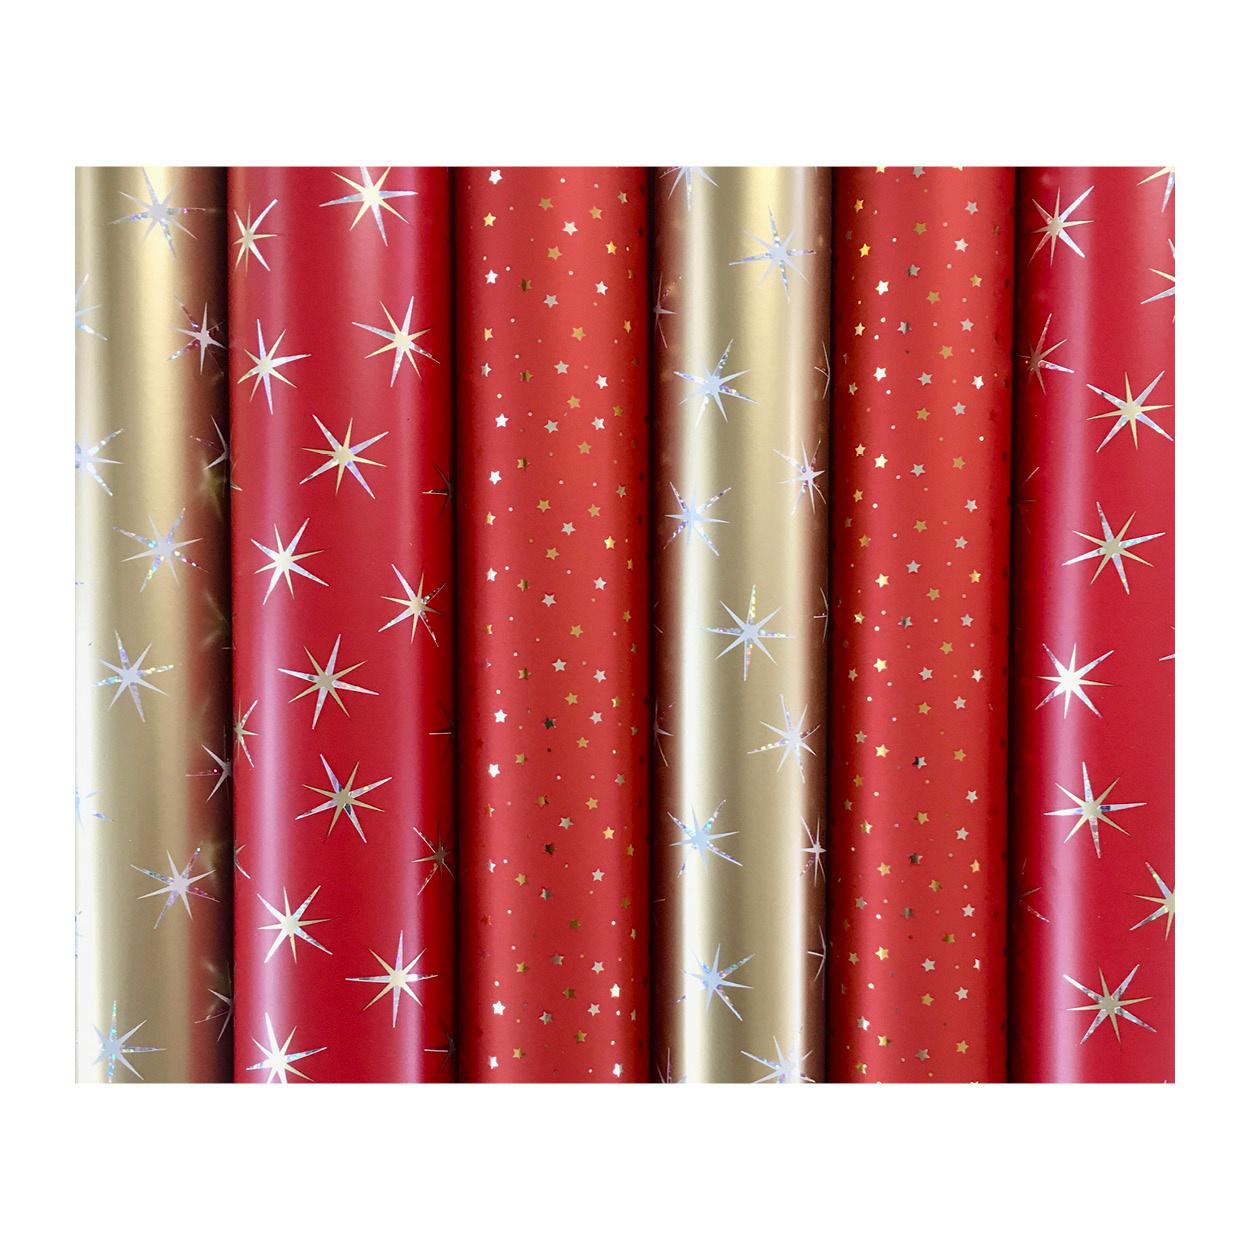 Gift wrap (per gift)